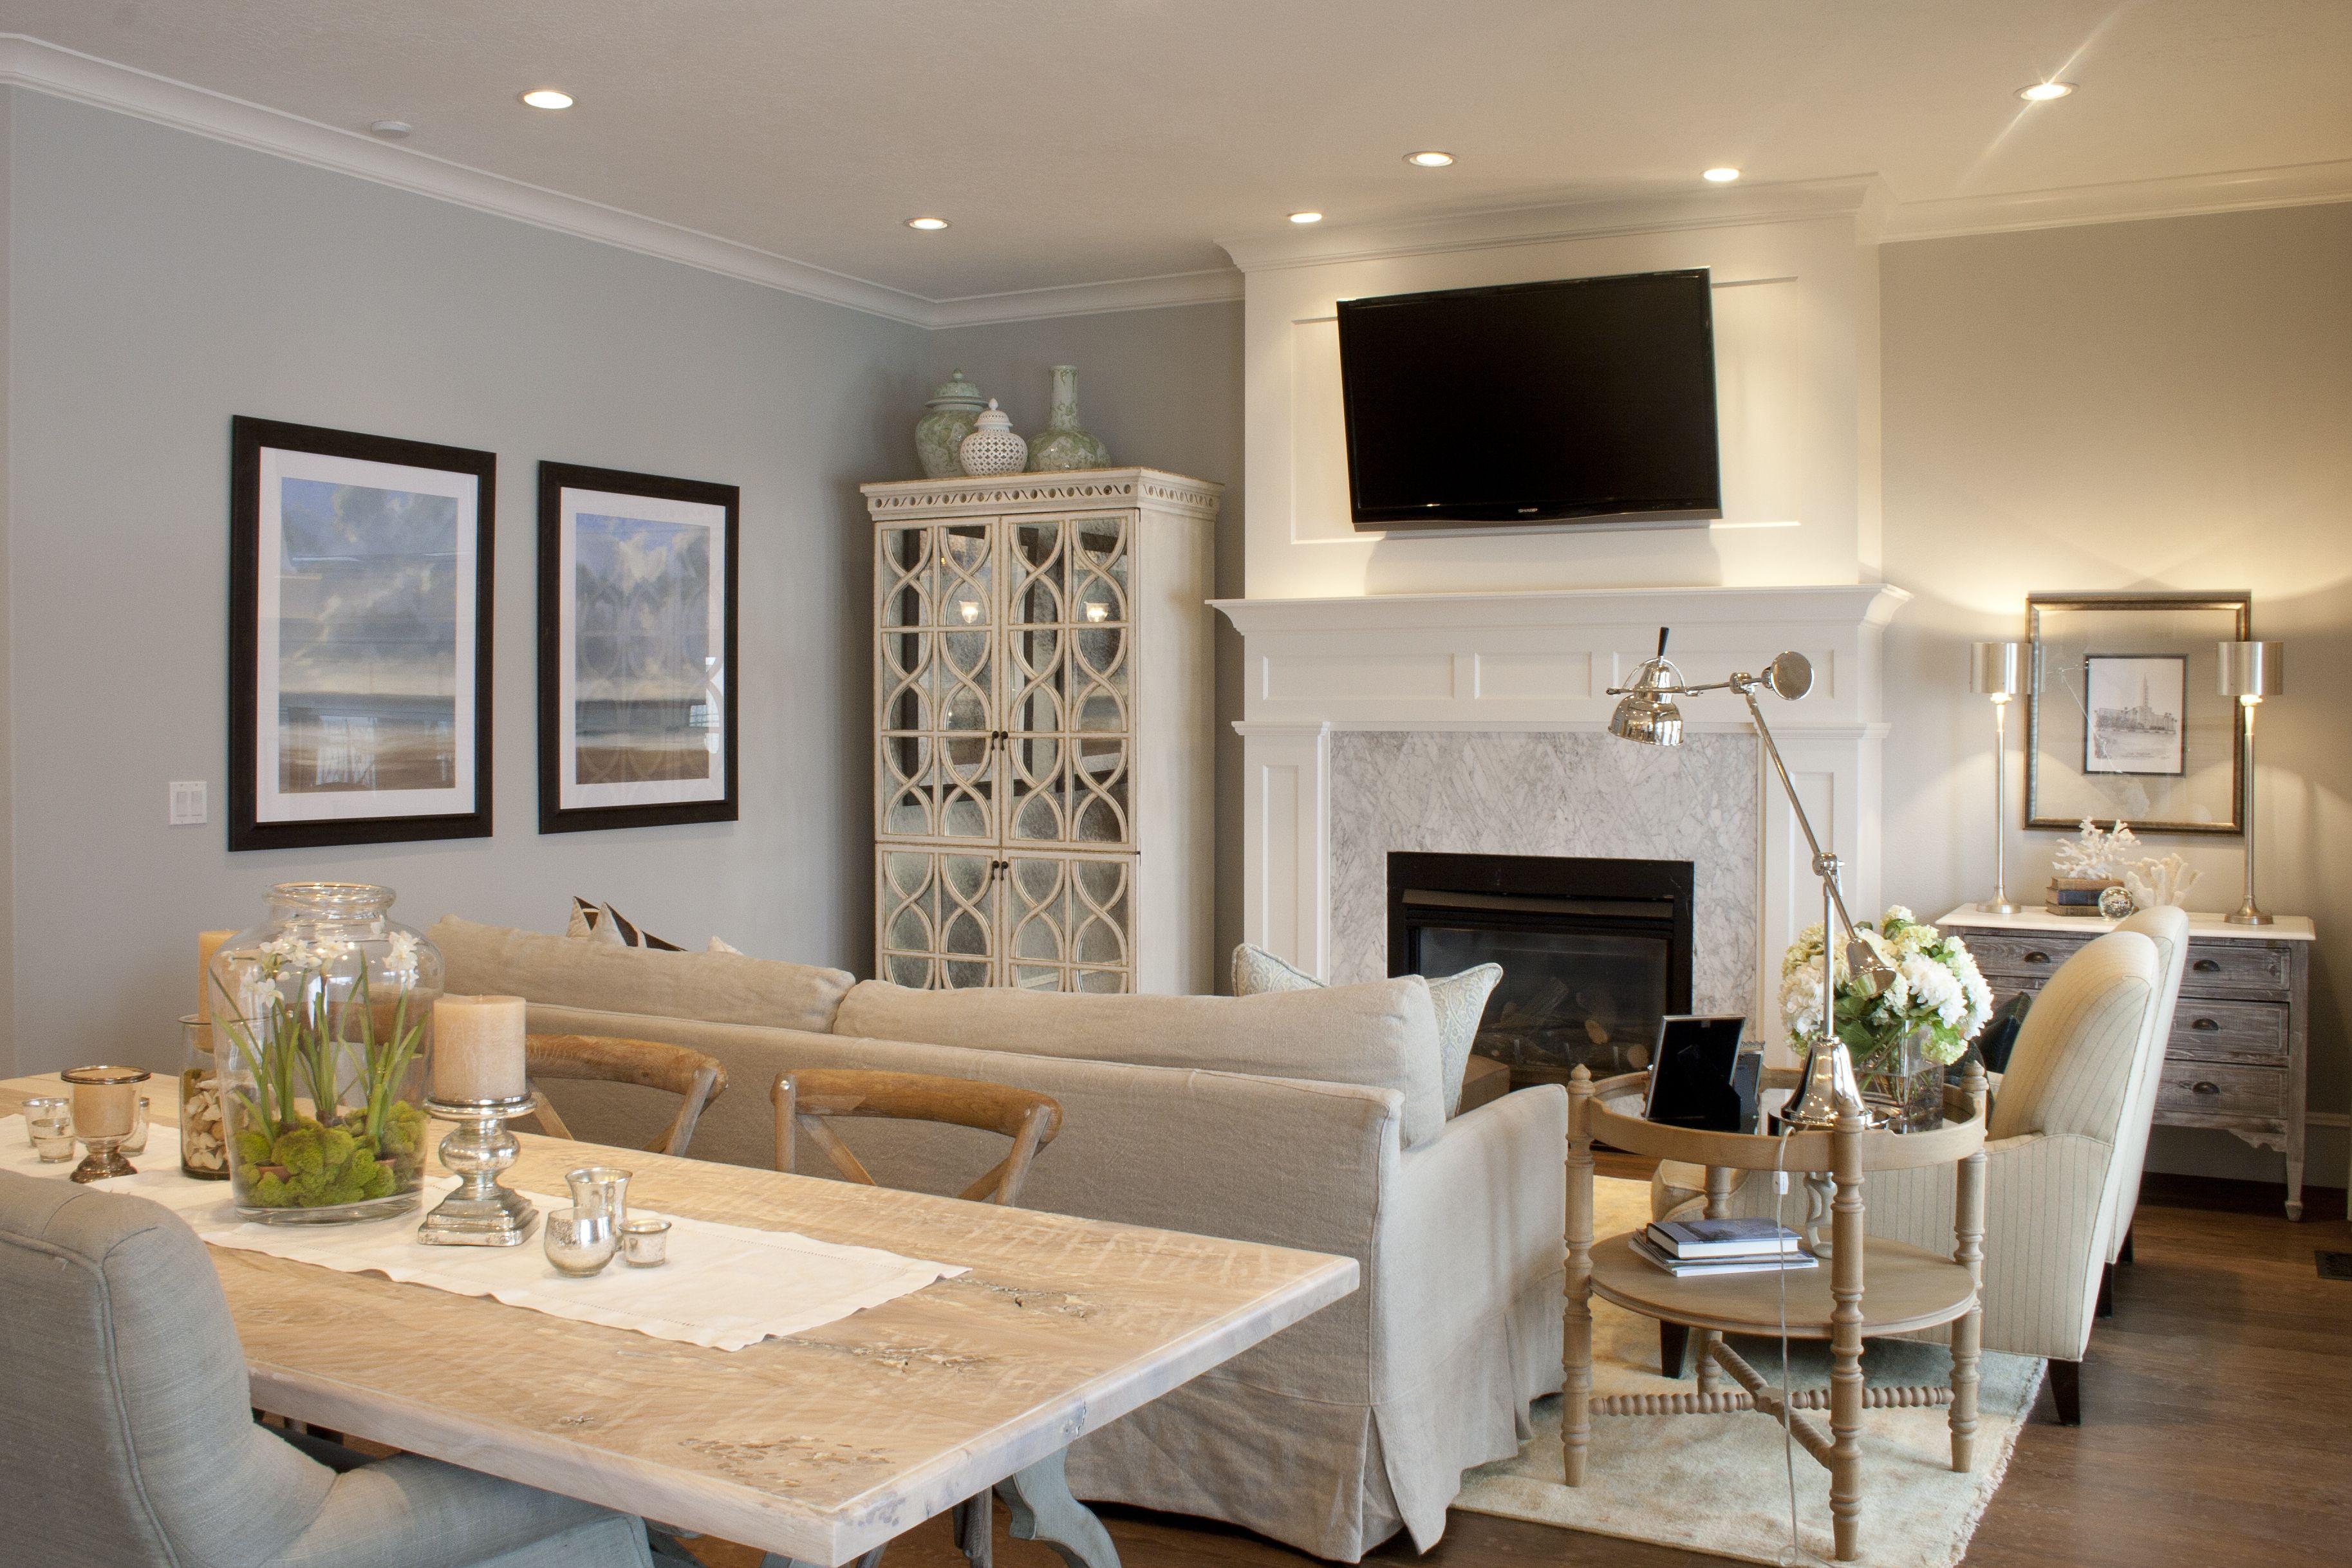 Al Bb Meikel56 Jpg 3654 2436 Living Room Dining Room C